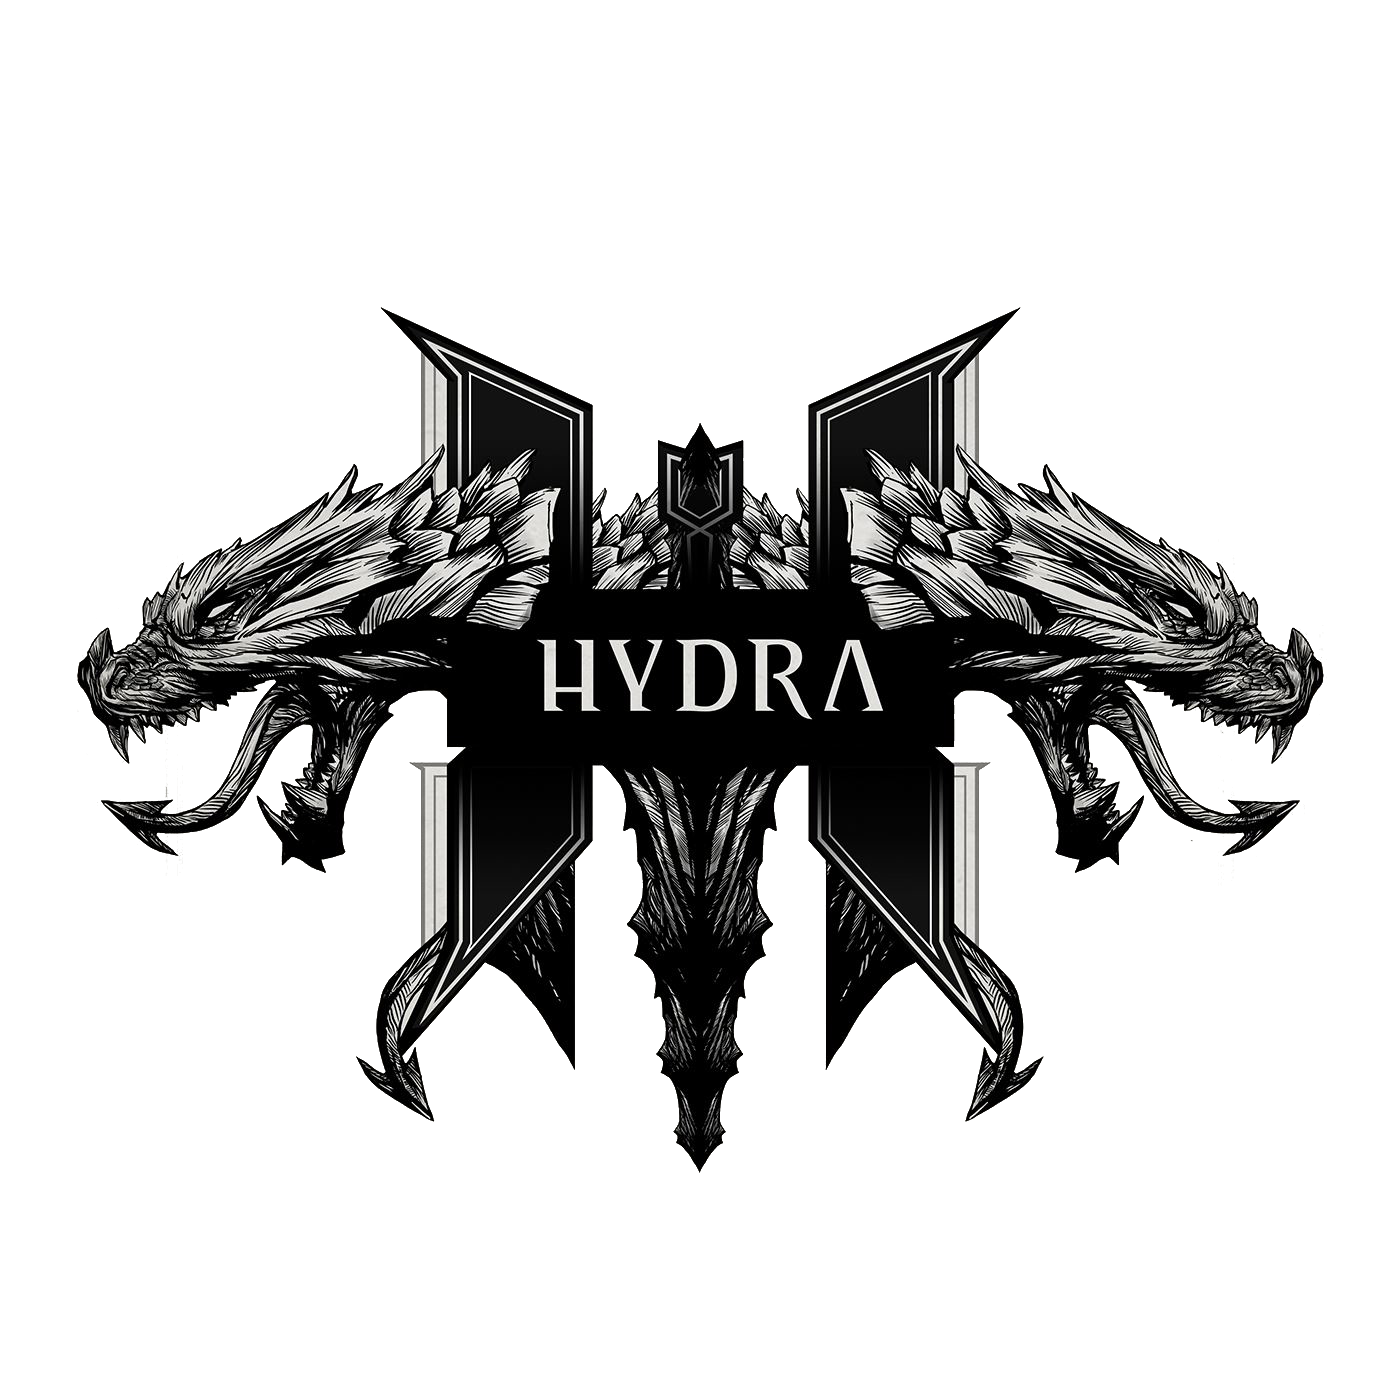 http://fc01.deviantart.net/fs70/f/2013/313/9/3/within_temptation___hydra__logo_png__by_baptistewsf-d6tkdsd.png